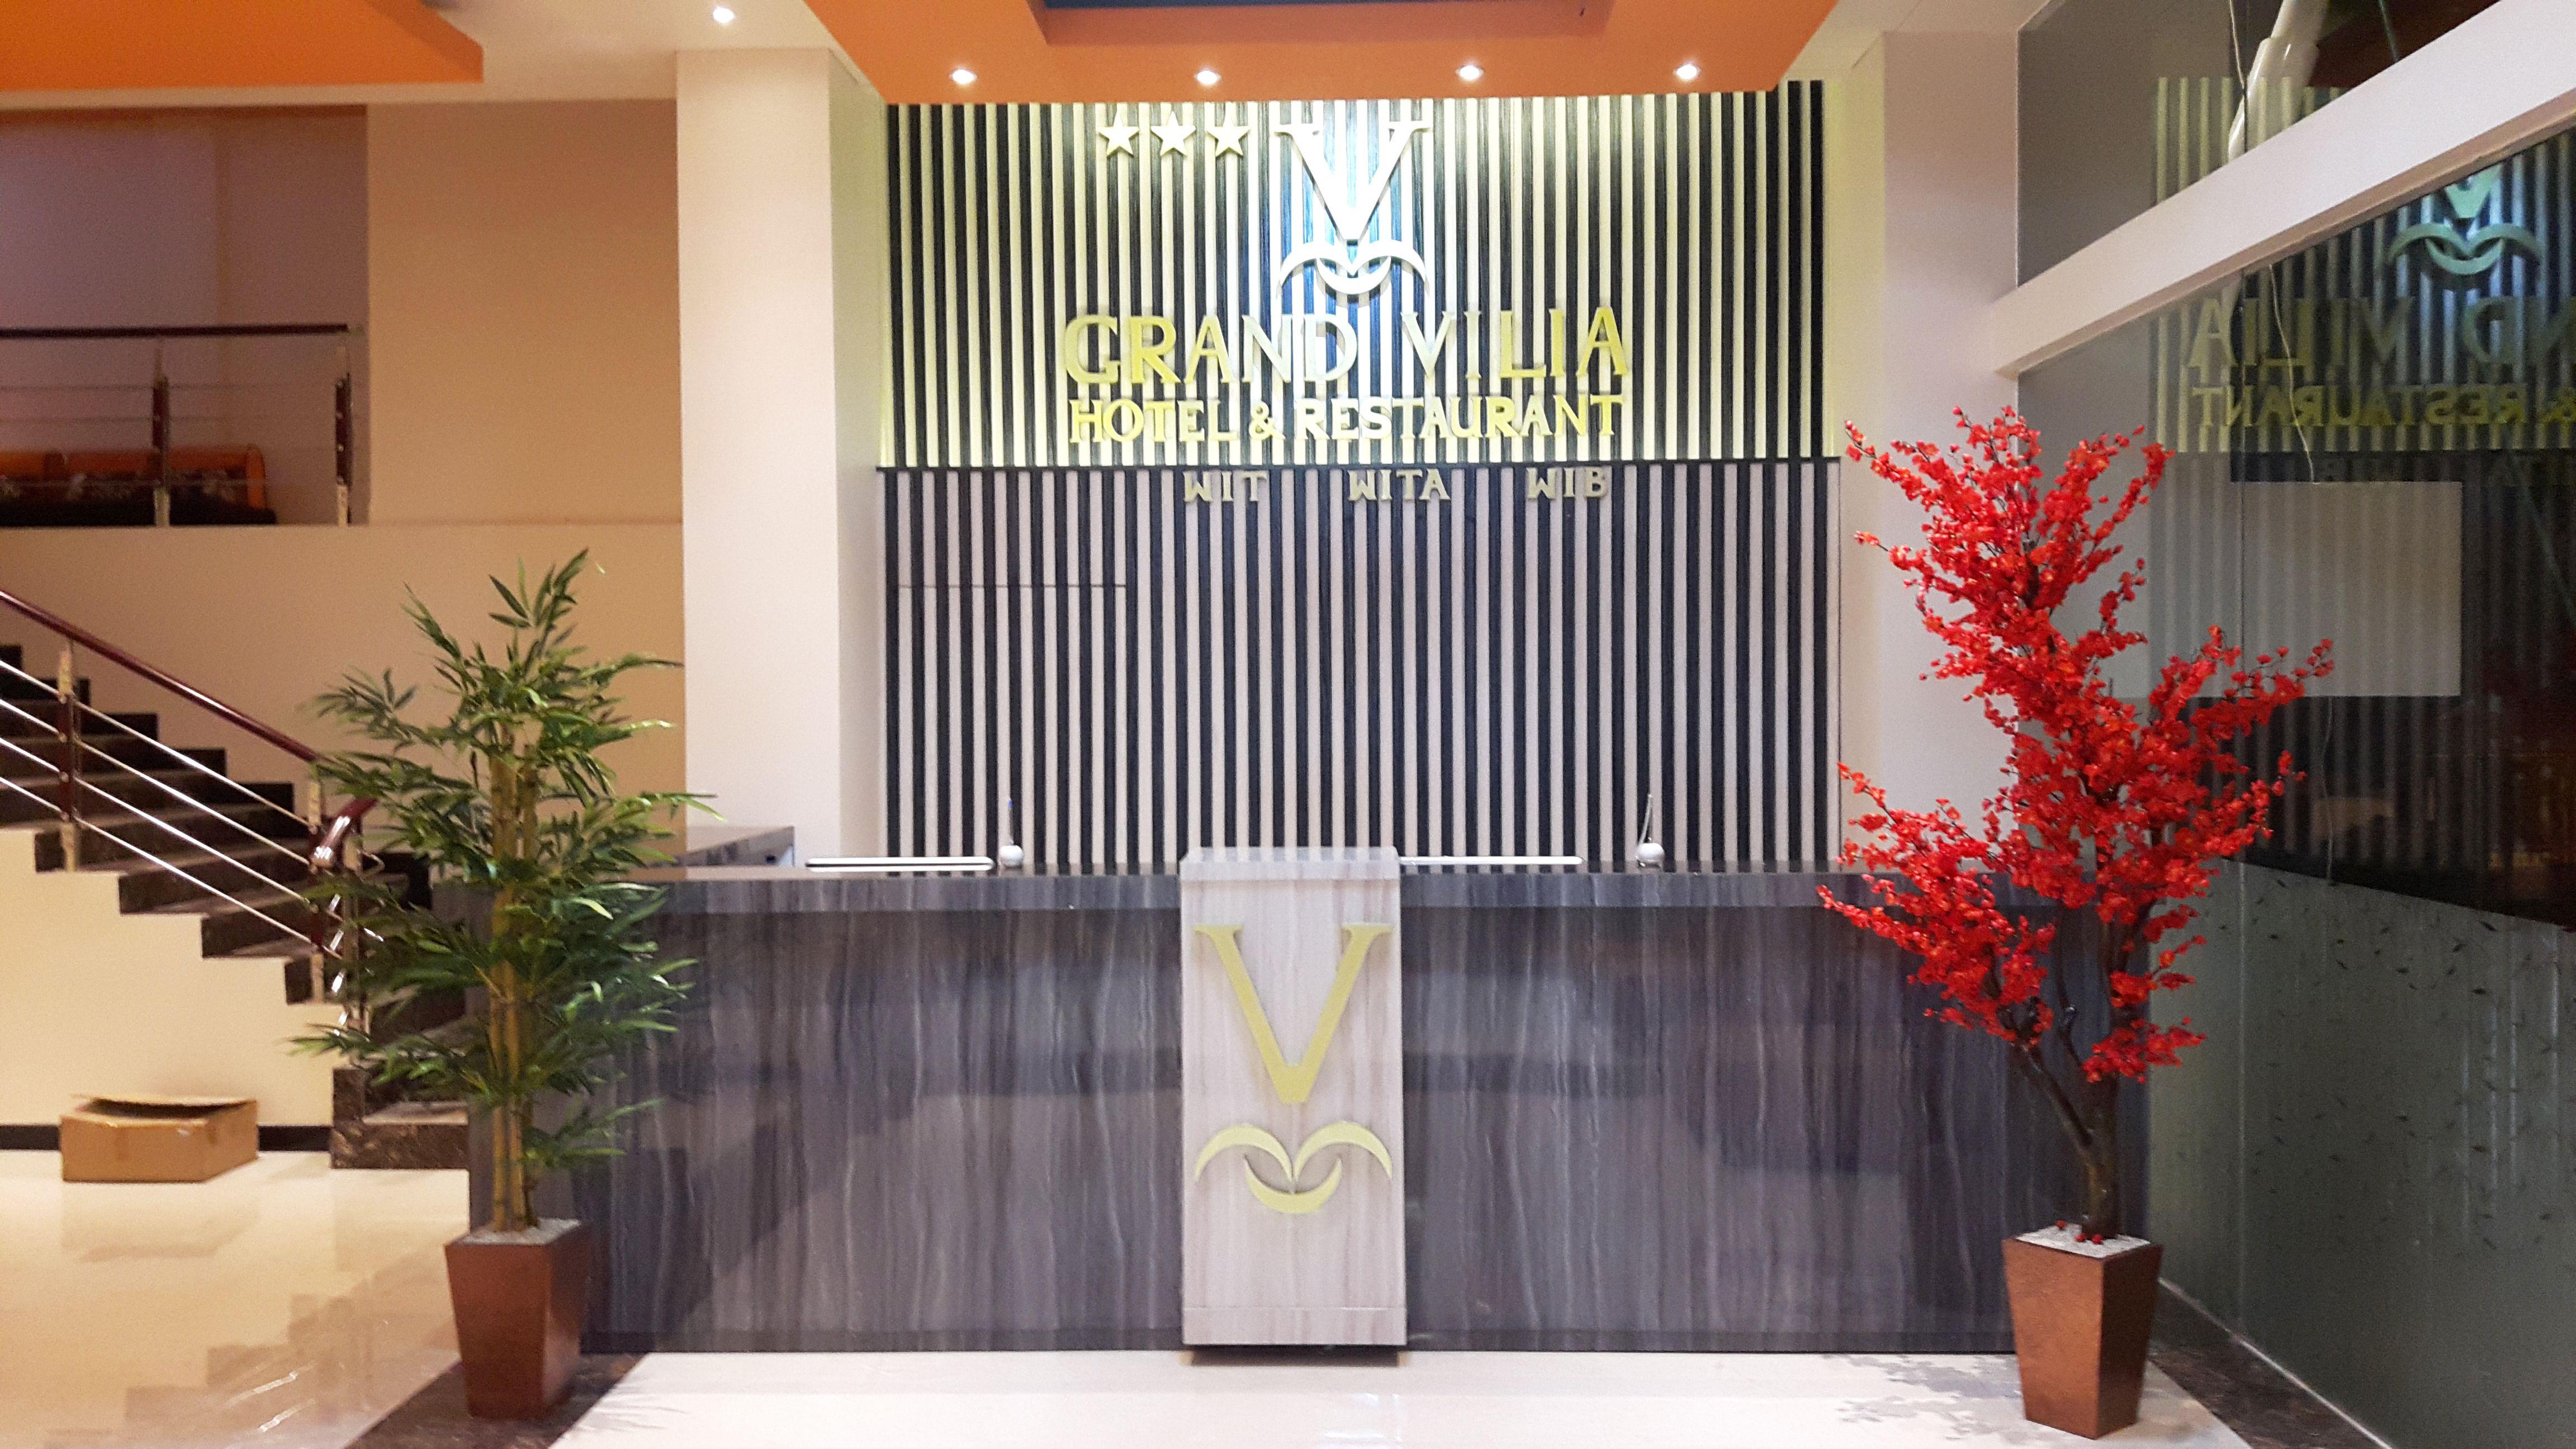 Grand Vilia Hotel Maluku, Maluku Tenggara